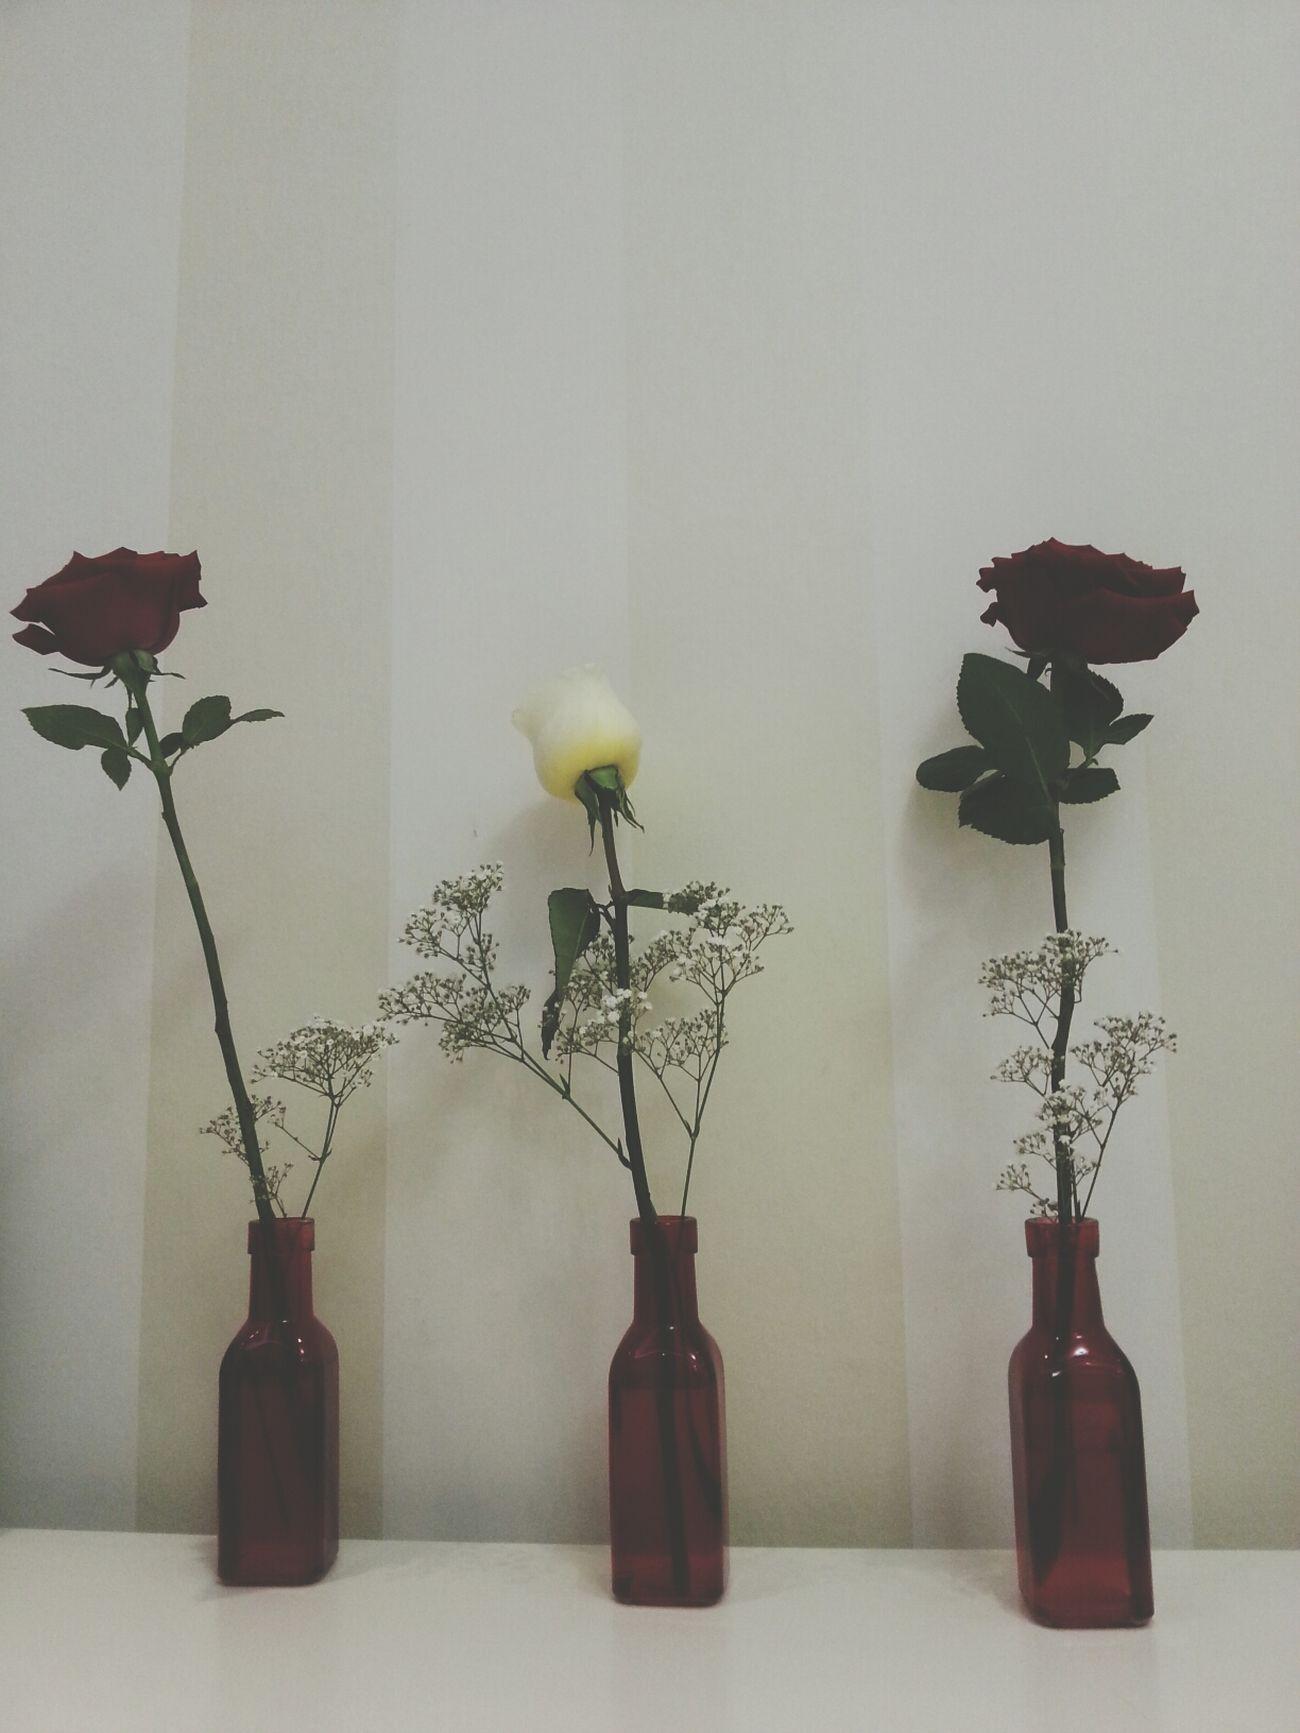 Random Flowers Rose♥ You Make Me Smile .